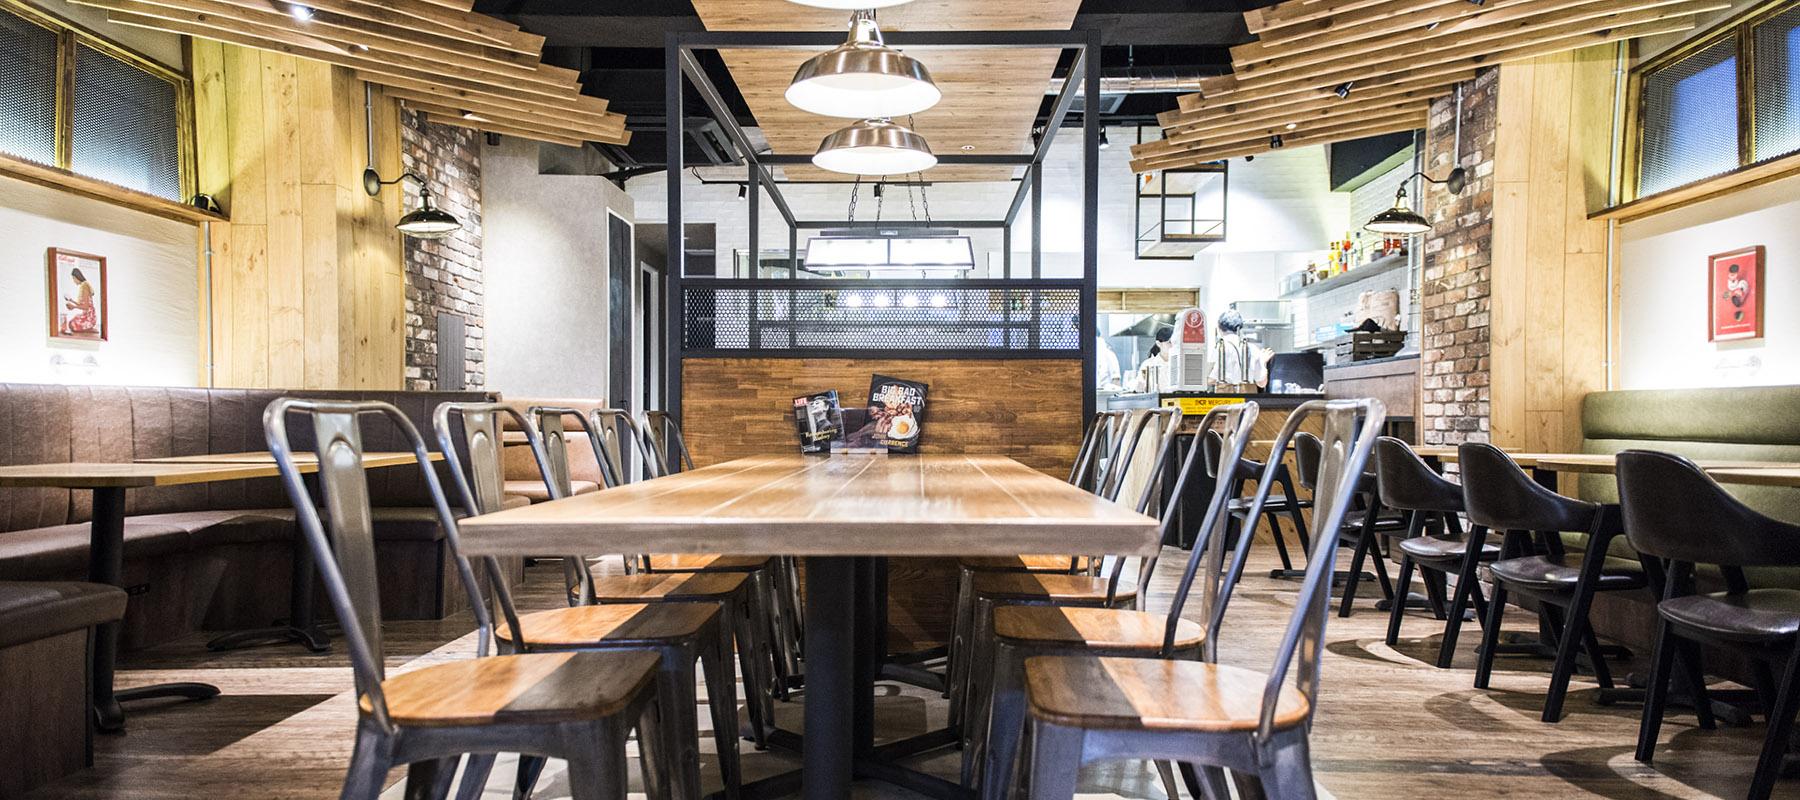 BURG HOLIC | 新宿四谷のグルメハンバーガー、ハンバーグカフェ